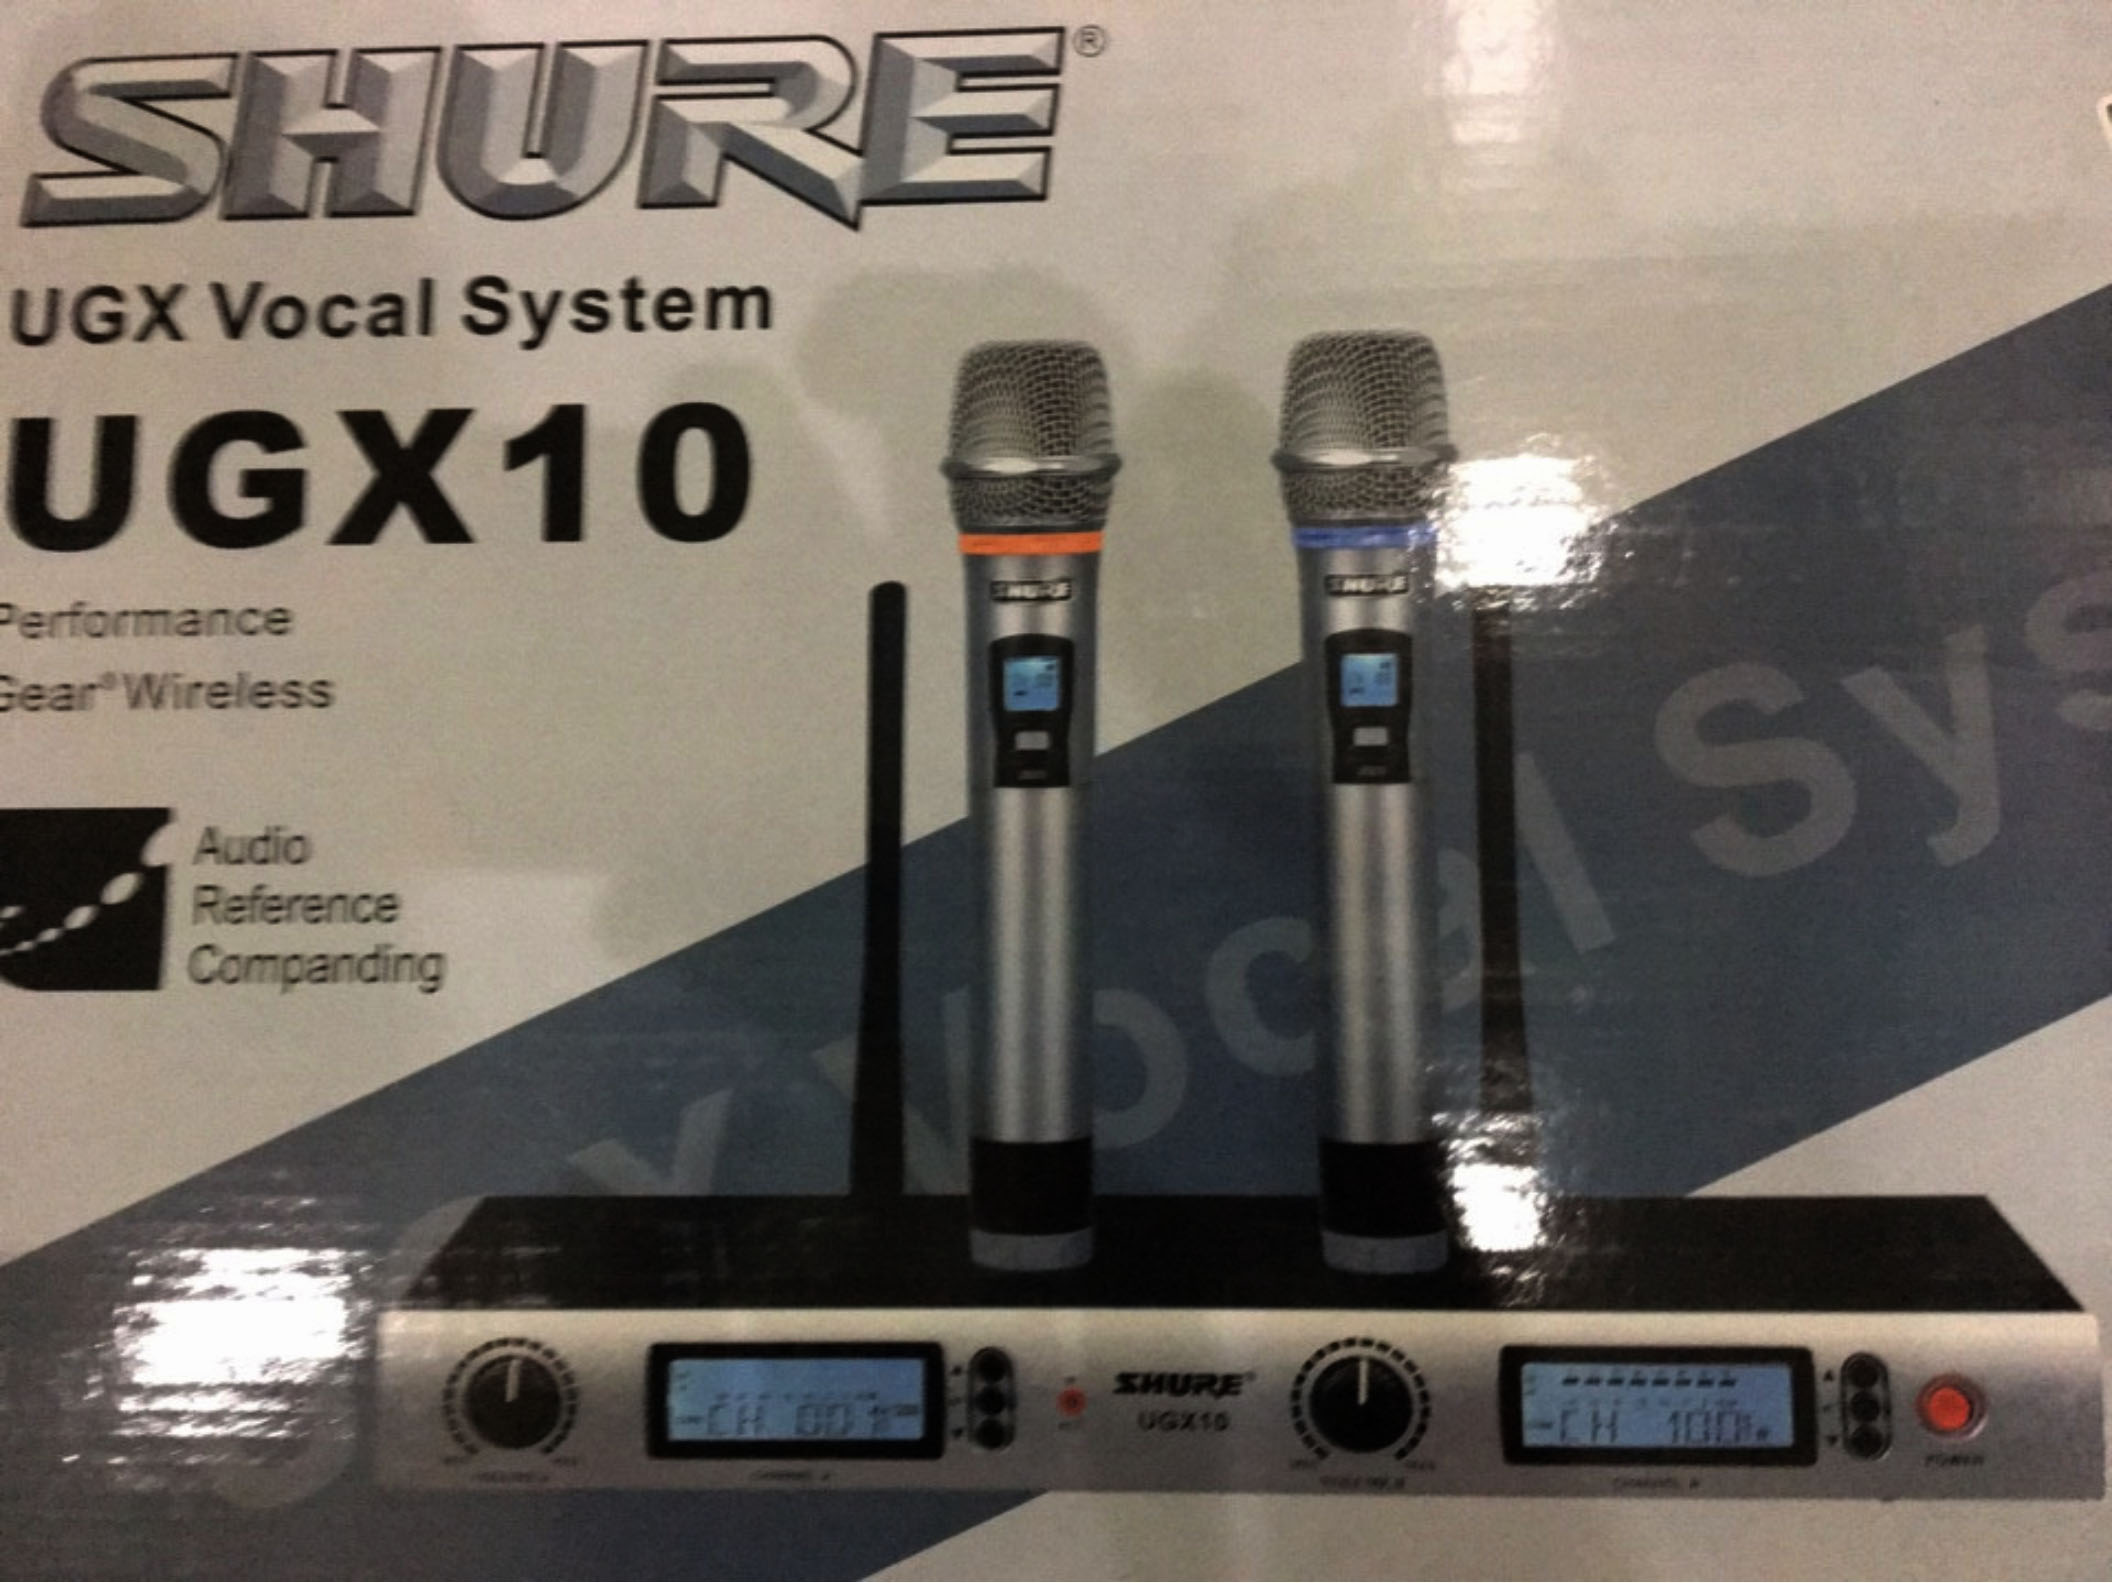 Micro shure UGX10